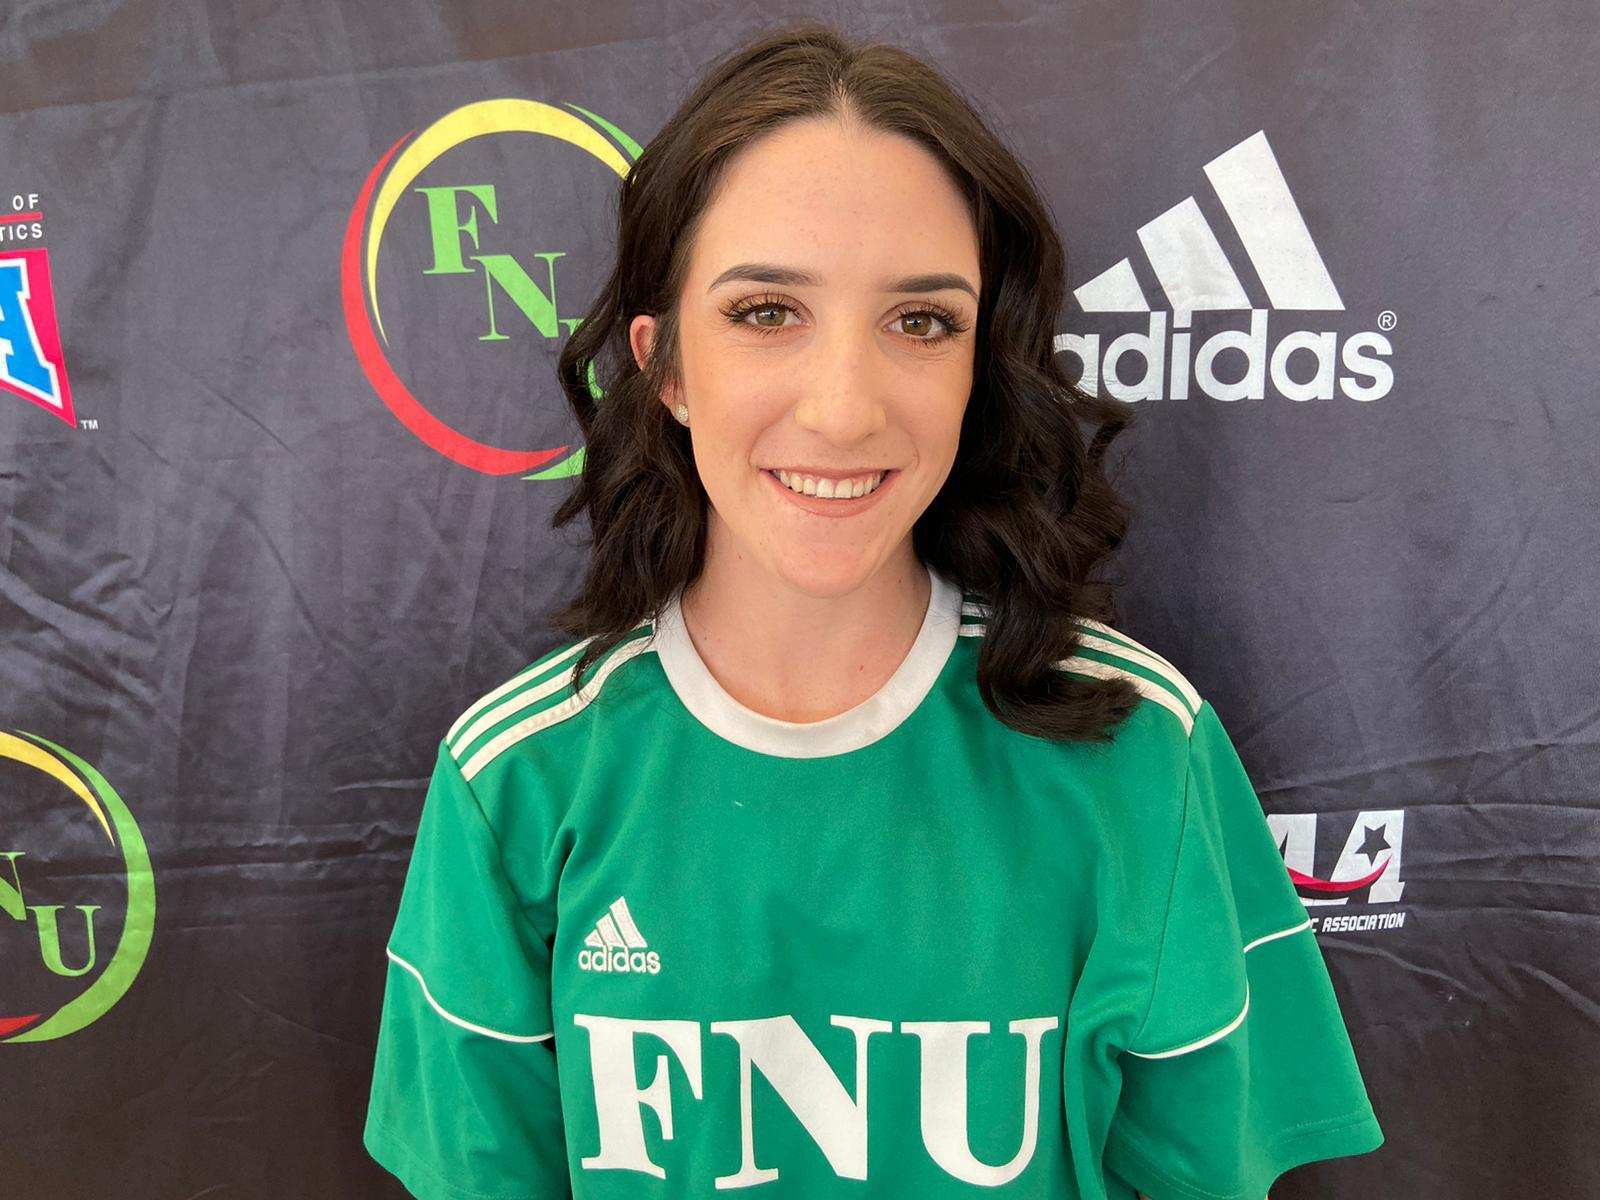 Nini Underwood FNU Softball Player